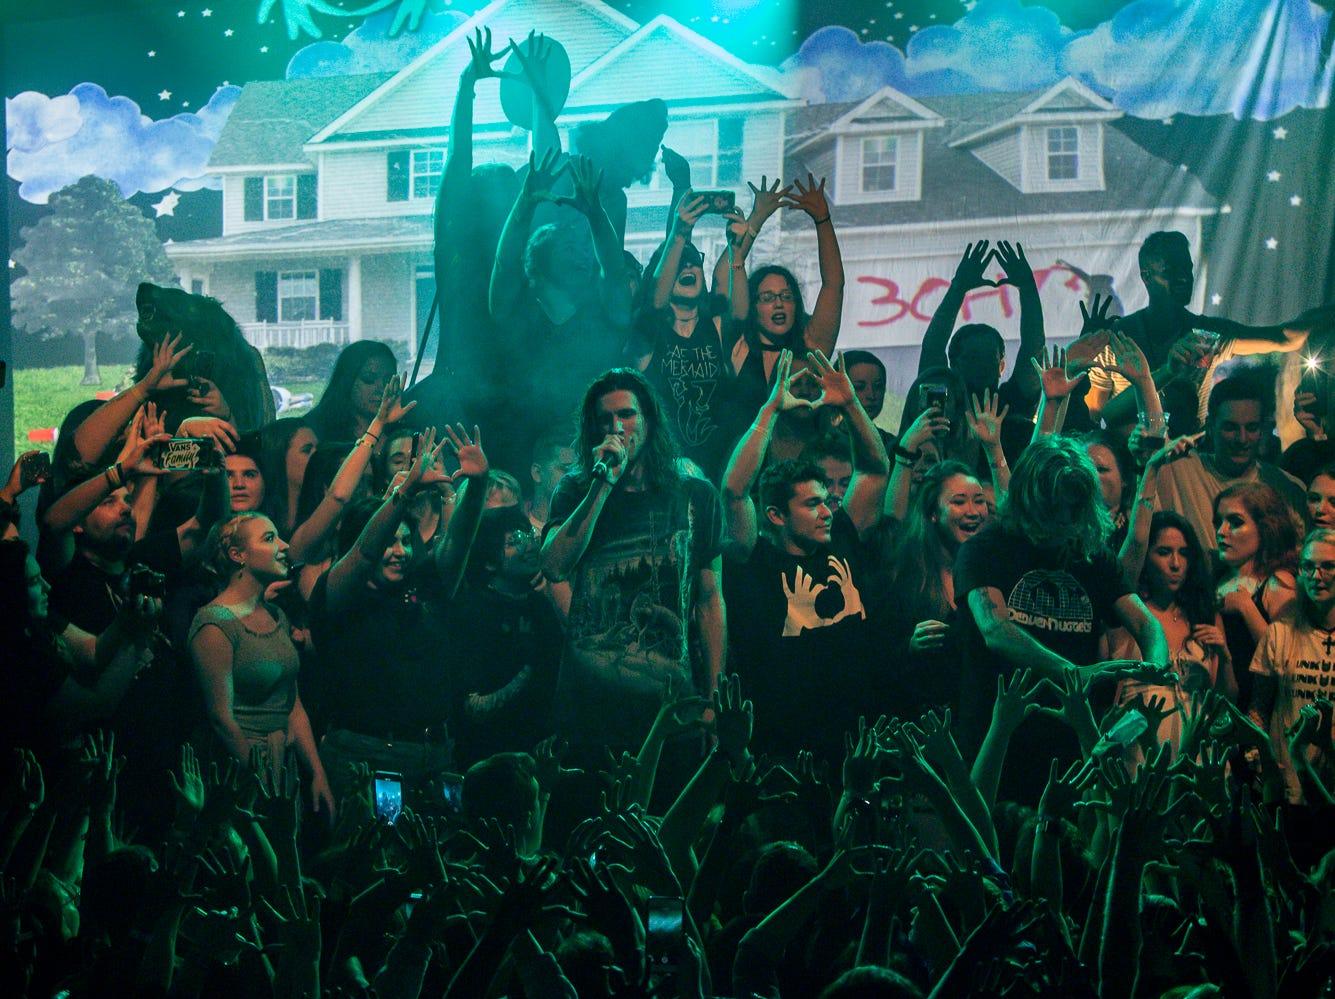 PHOTOS: 3OH!3 brings down the house at Vinyl